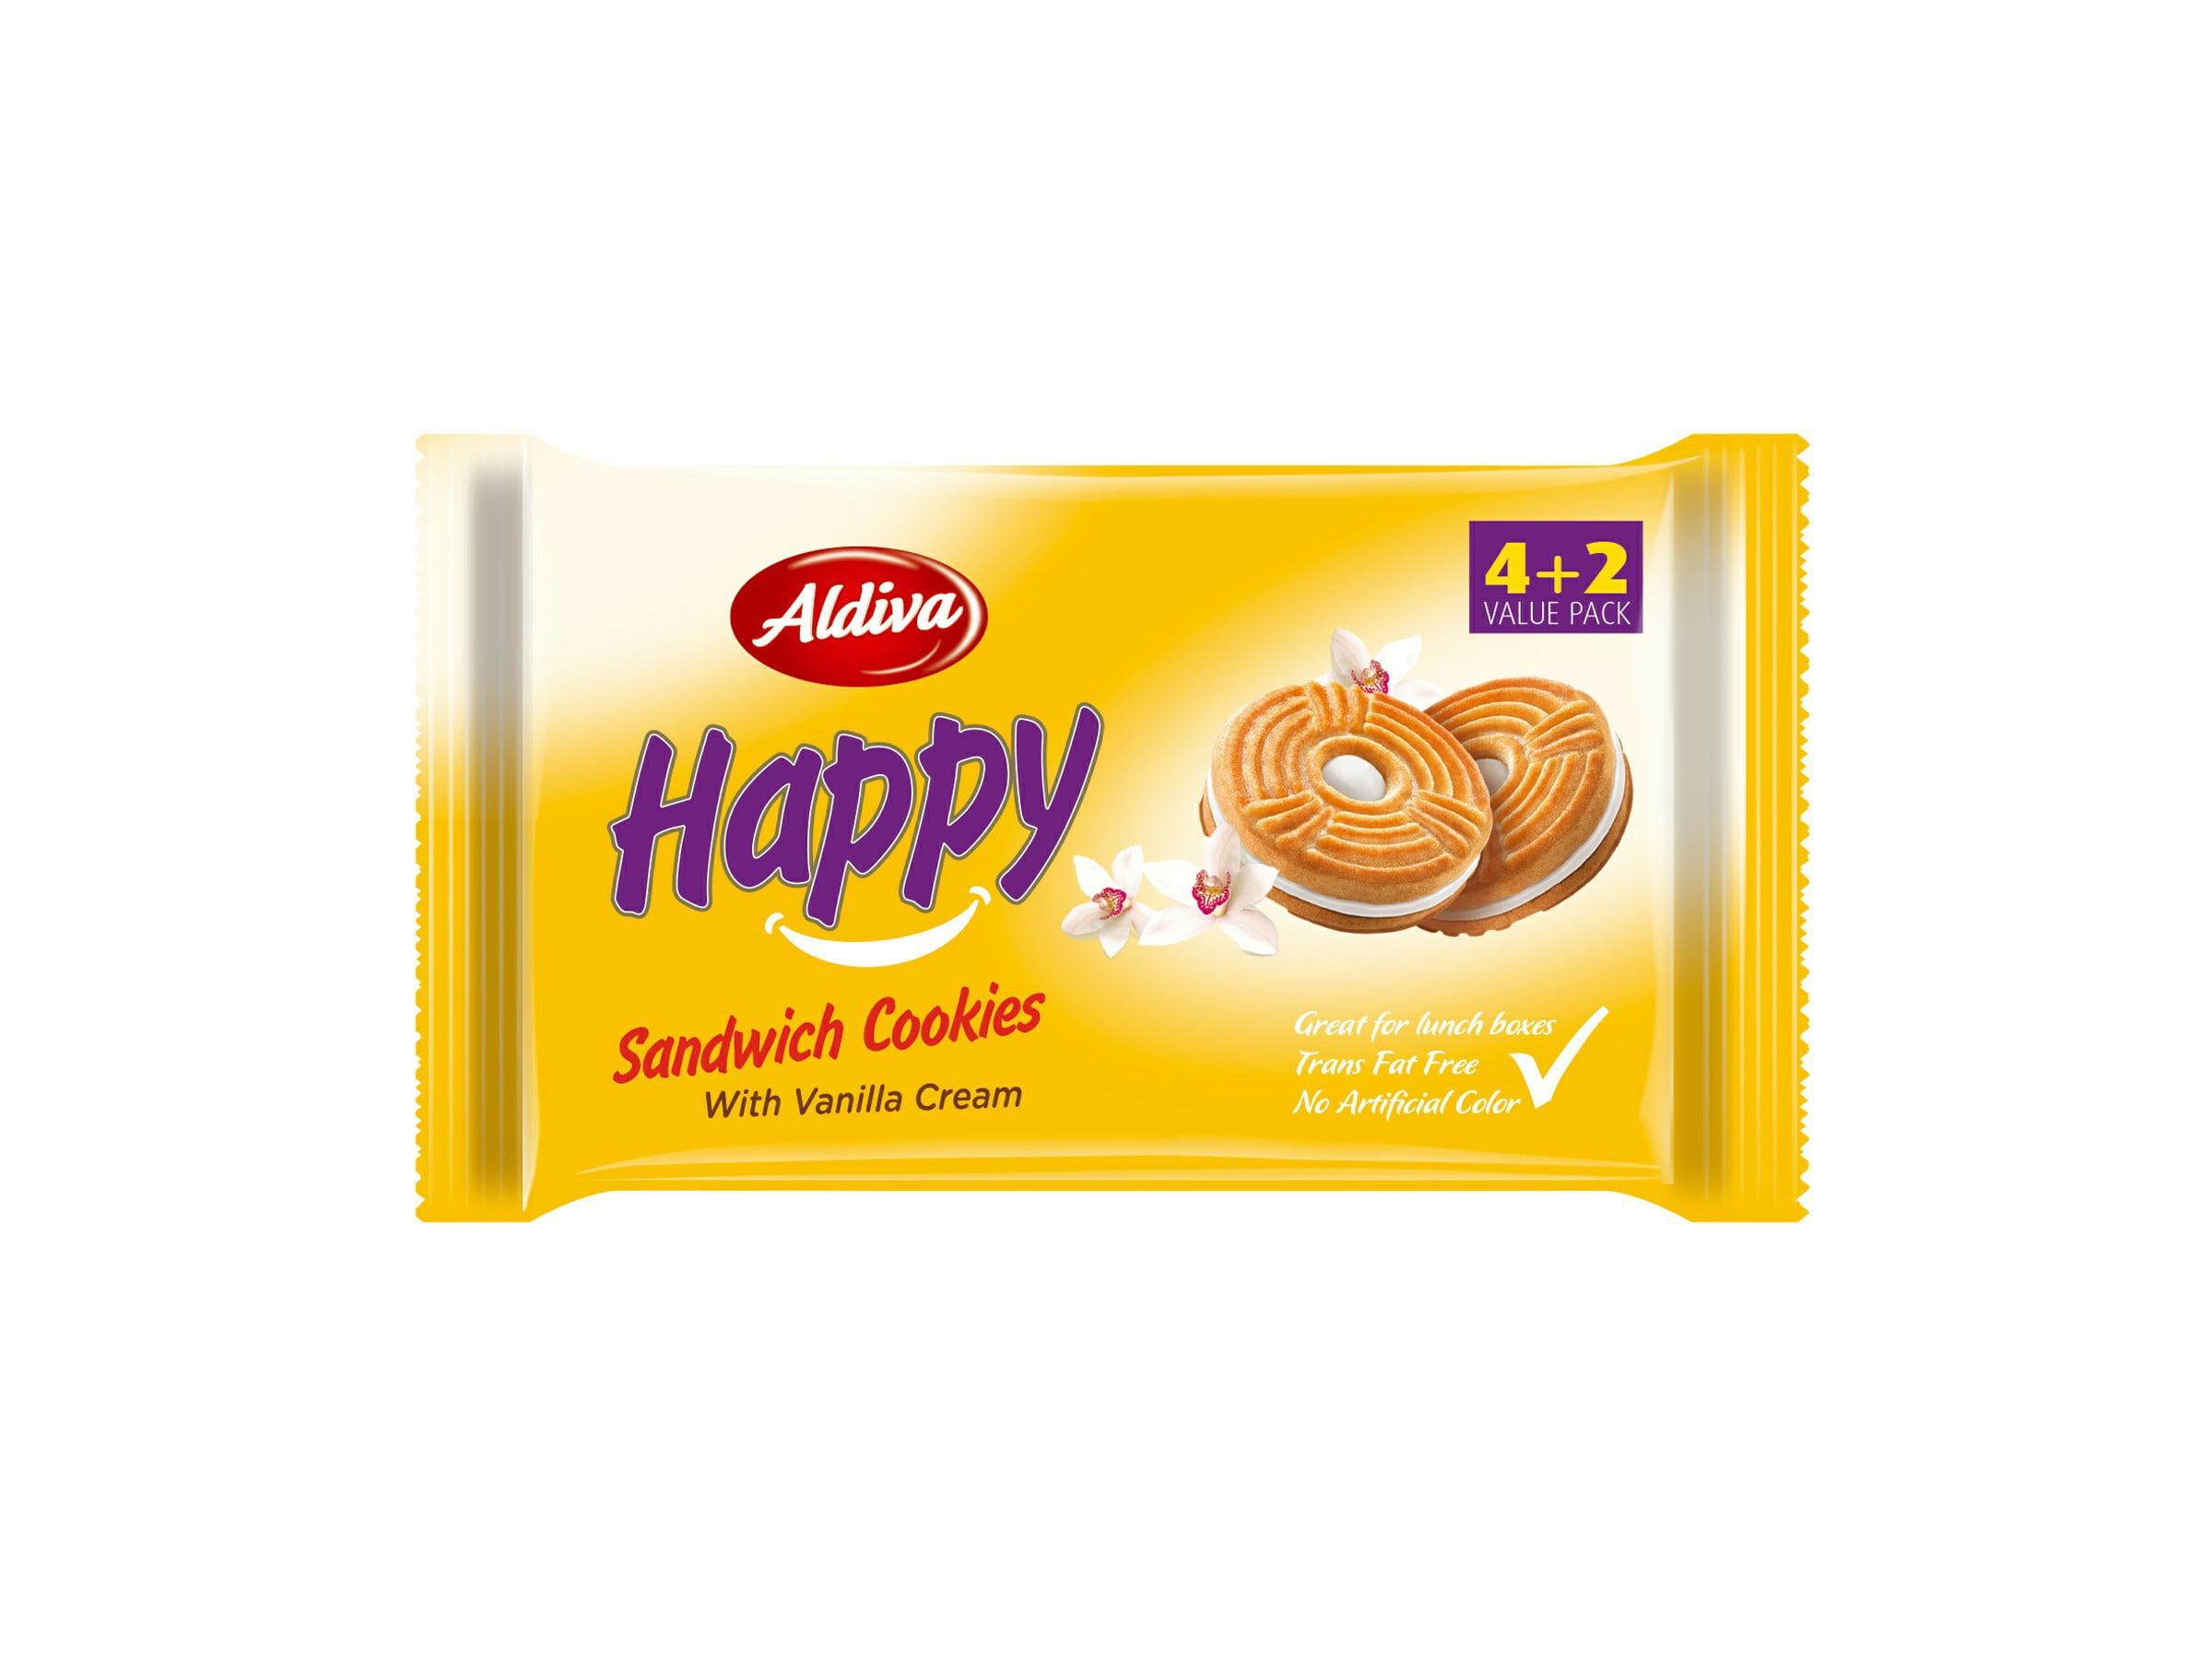 BEST BEFORE 19/10/2021 ALDIVA HAPPY SANDWICH COOKIES WITH VANILLA CREAM Flava Benefits